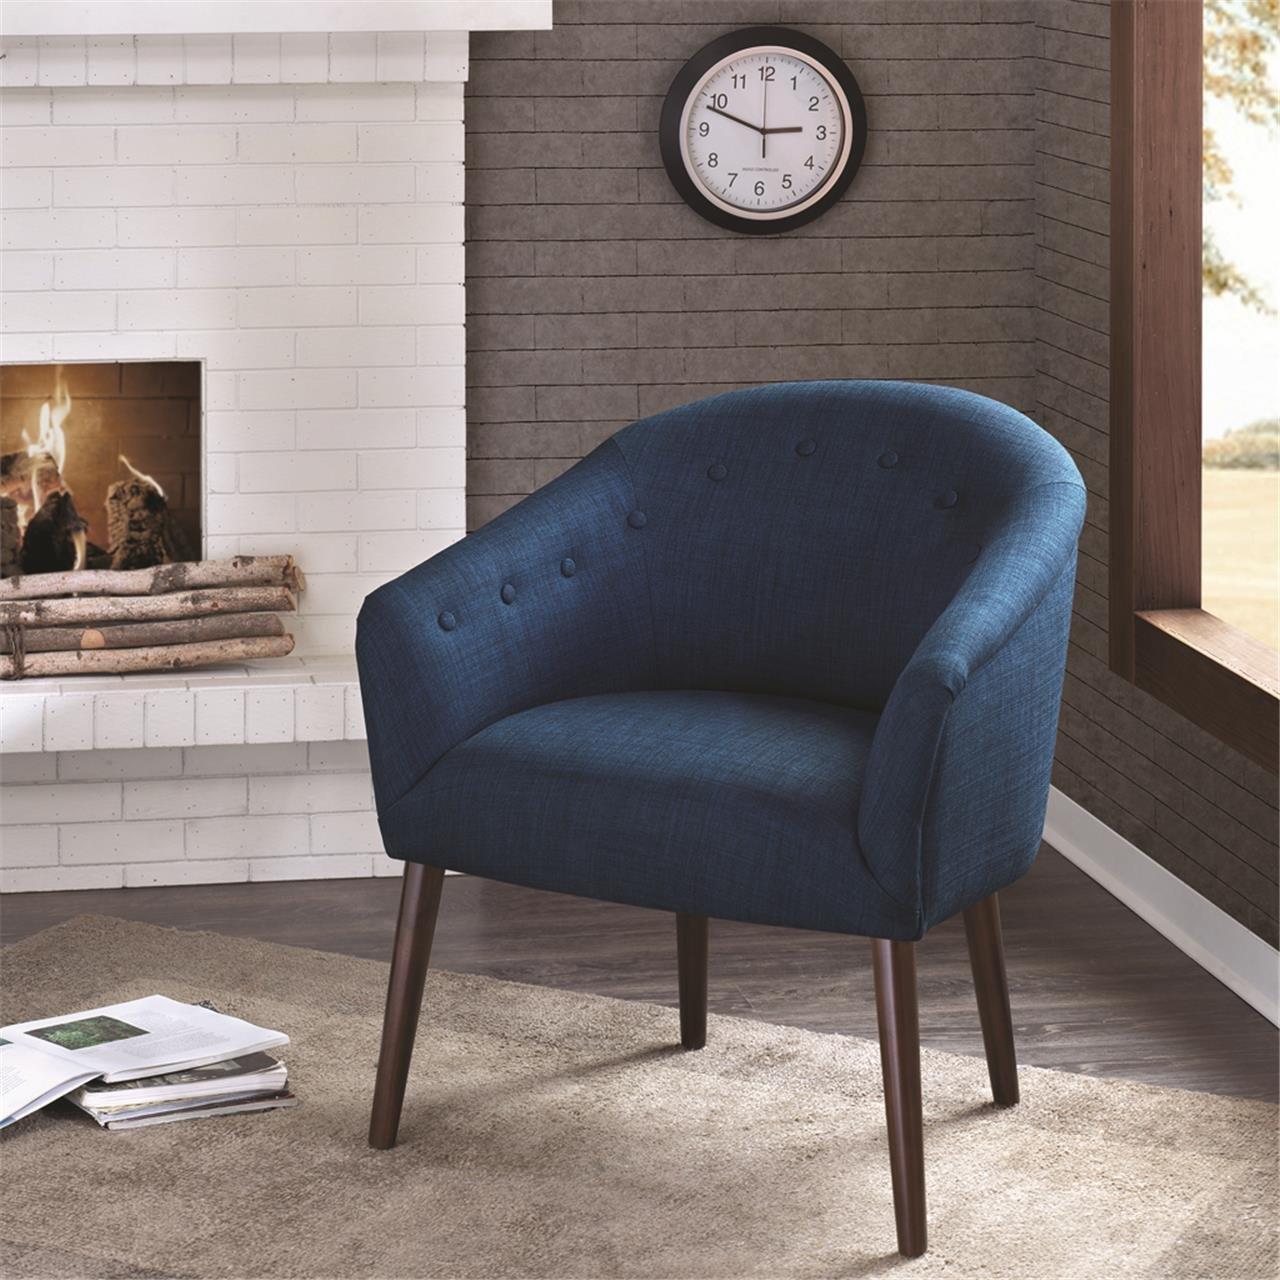 Amazon.com: Madison Park Camilla Chair, 27 X 26.5 X 29.5, Navy: Kitchen U0026  Dining